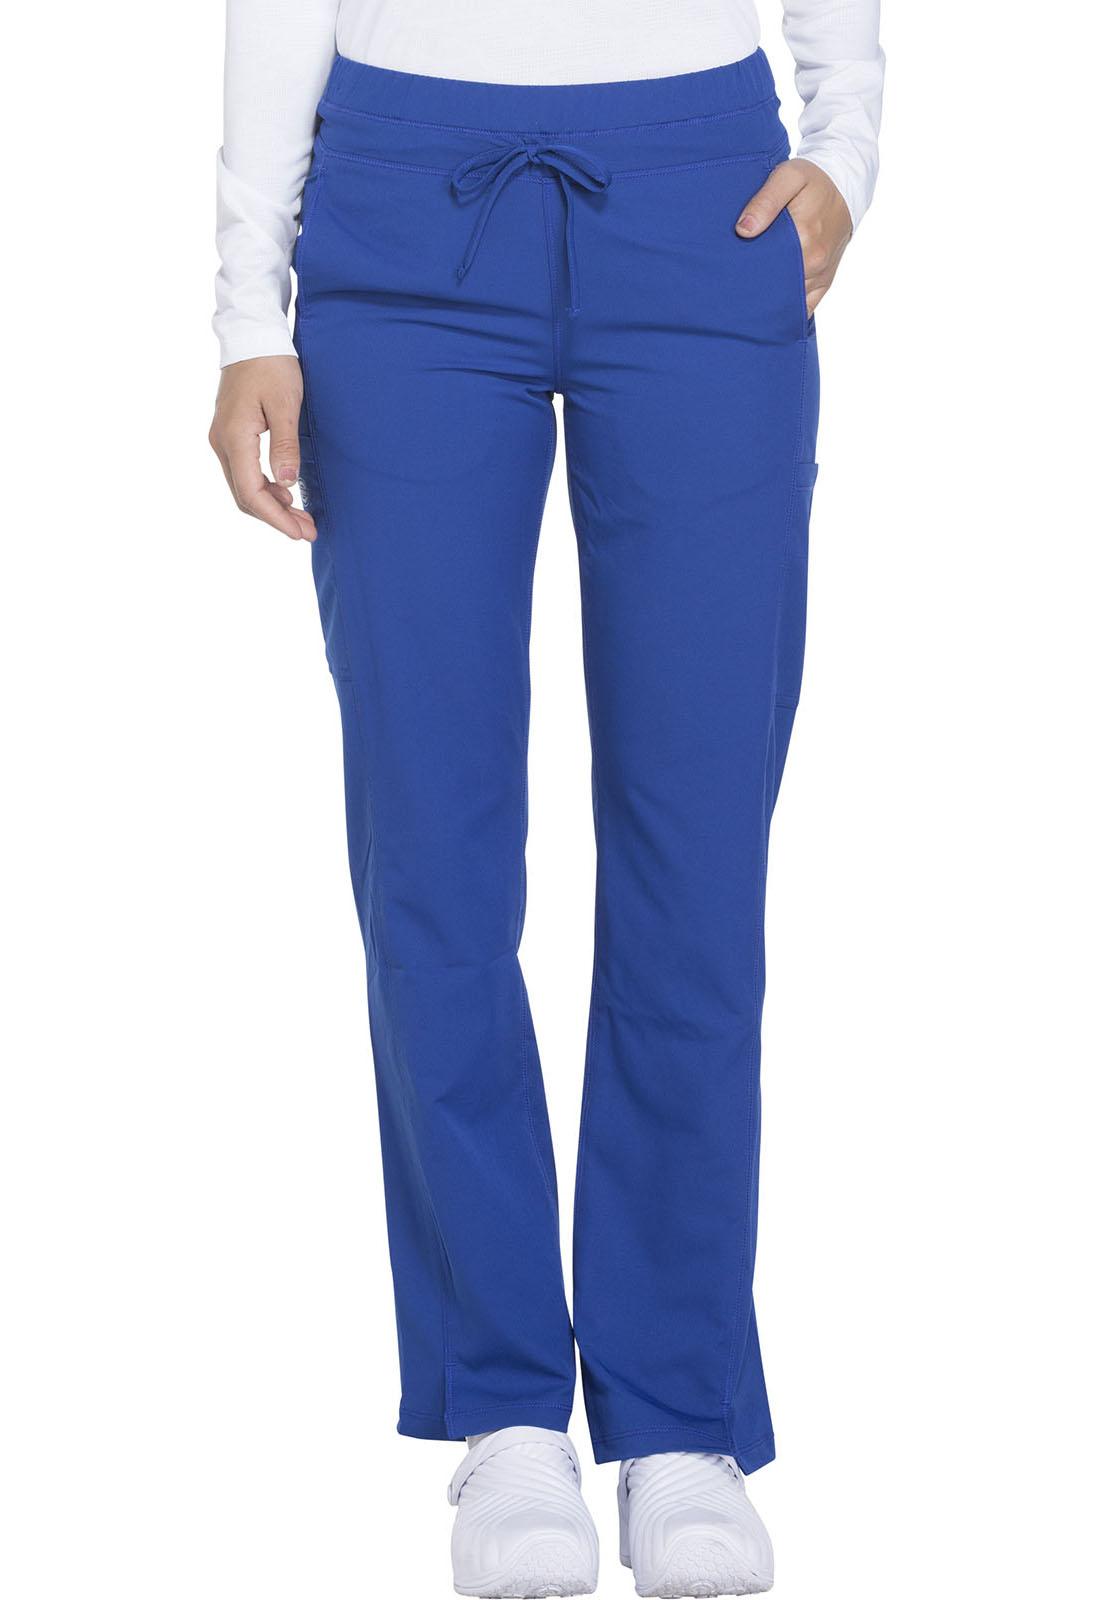 00445f0570f Dynamix Mid Rise Straight Leg Drawstring Pant in Galaxy Blue DK130P ...